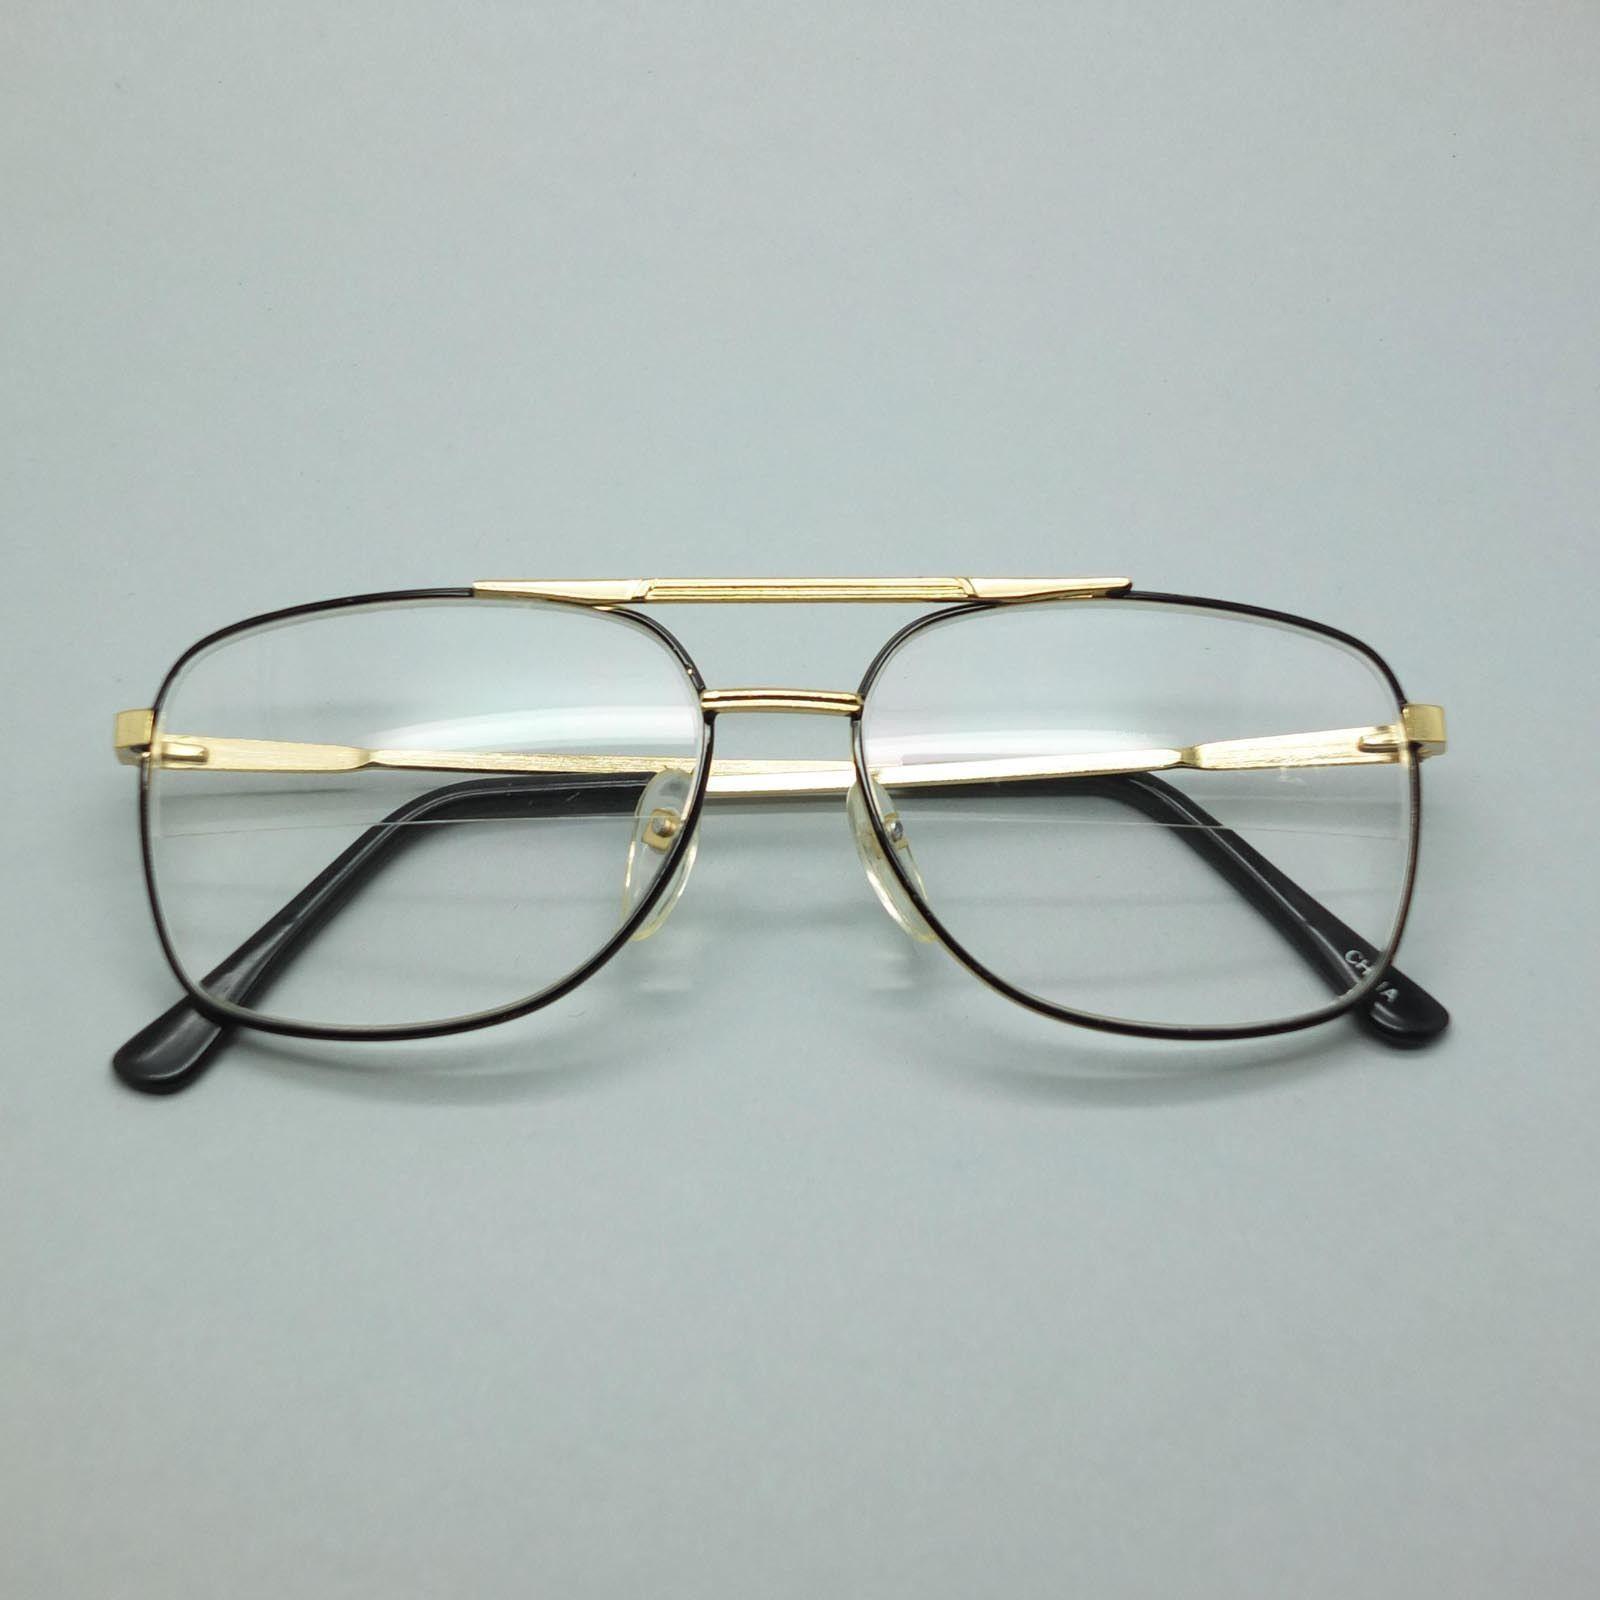 679b1453880 Reading Glasses True Straight Half Bifocal Lens Classic Metal Black Frame  +1.75